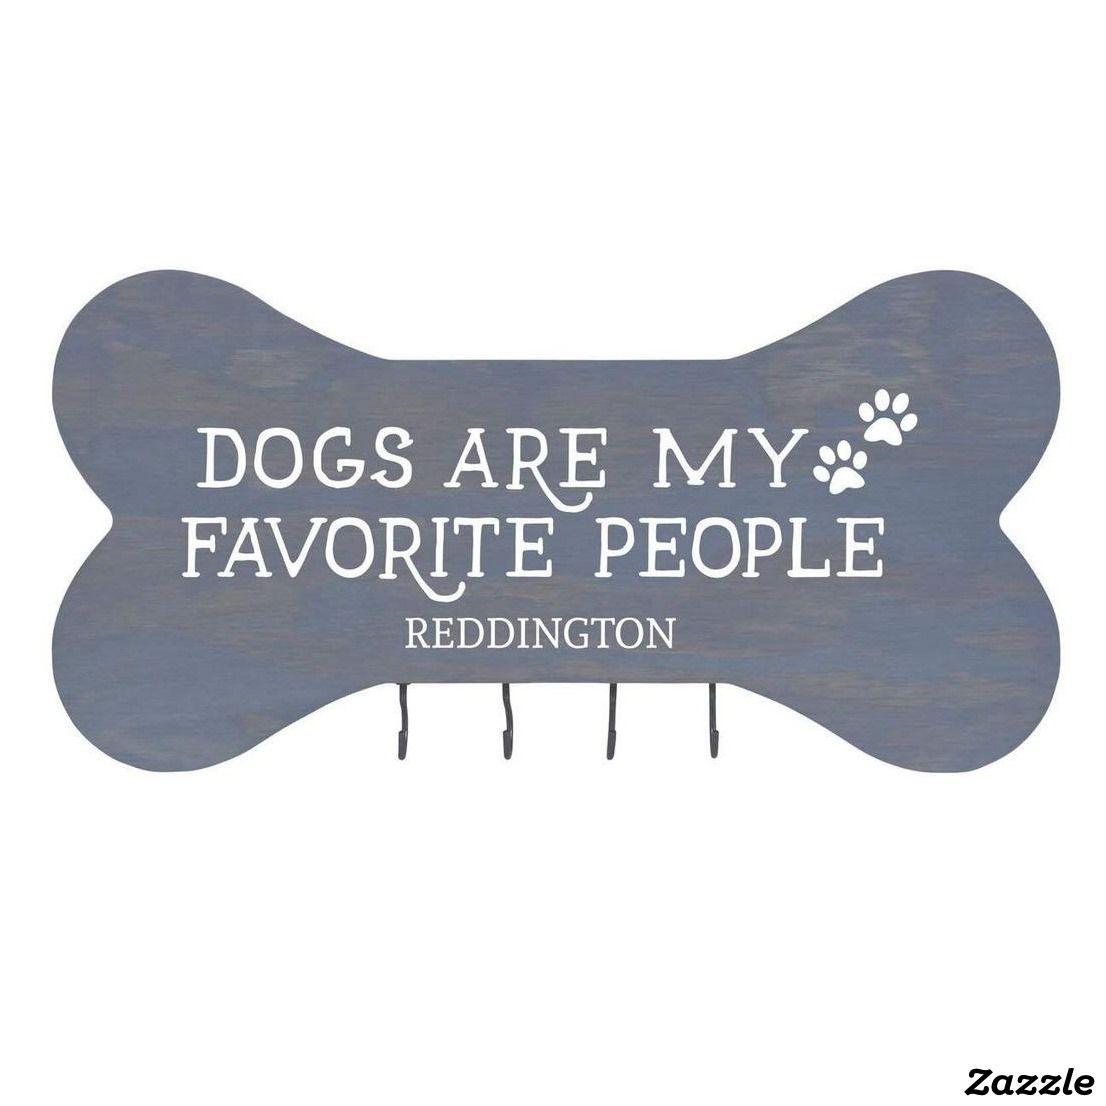 Dogs Are My Favorite People Gray Leash Rack Zazzle Com In 2021 Dog Leash Hanger Diy Dog Stuff Dog Items